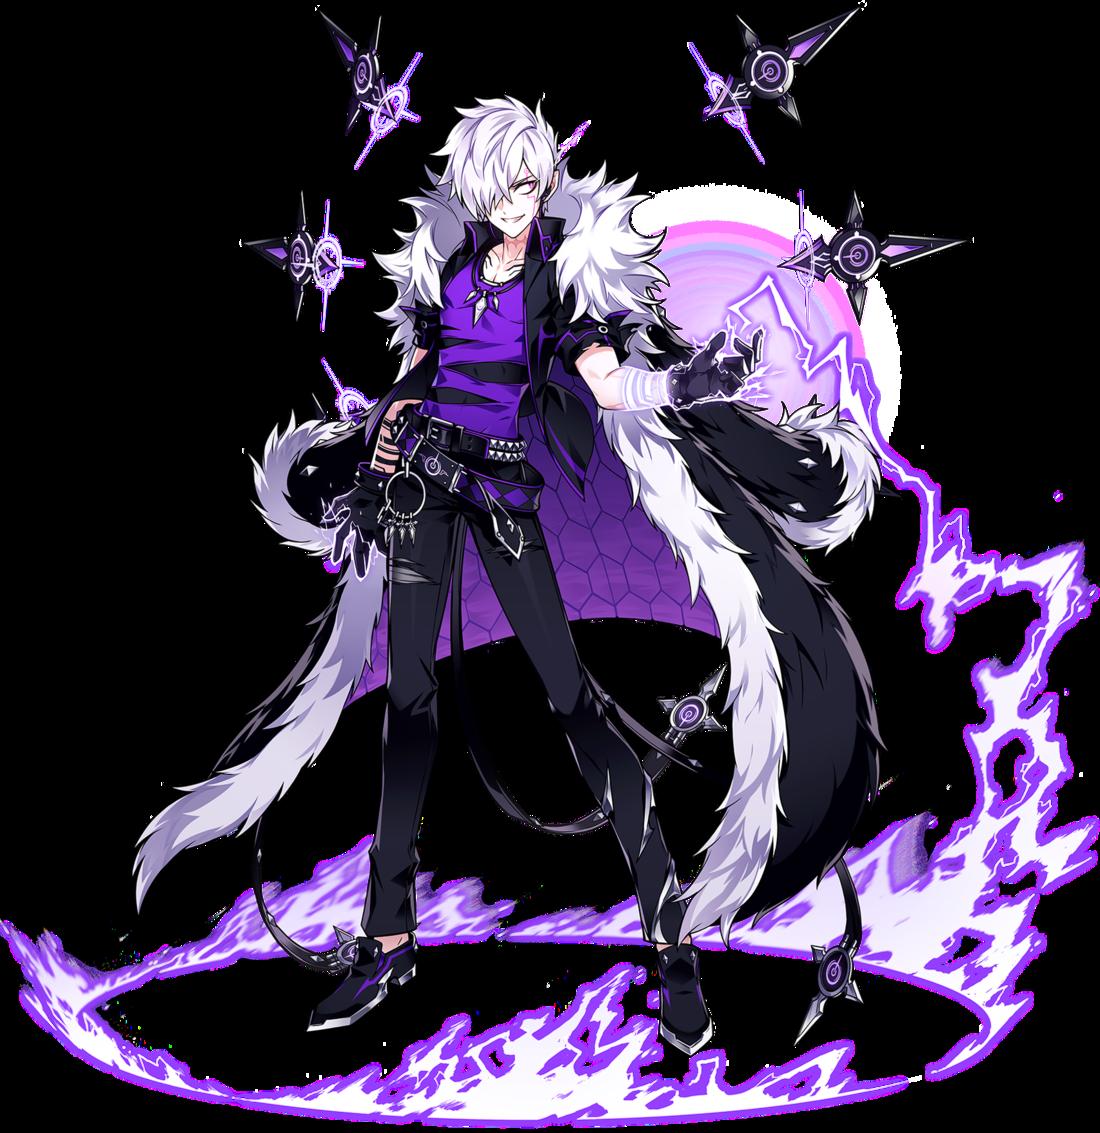 Portrait Doom Bringer Png Elsword Anime Warrior Anime Character Design